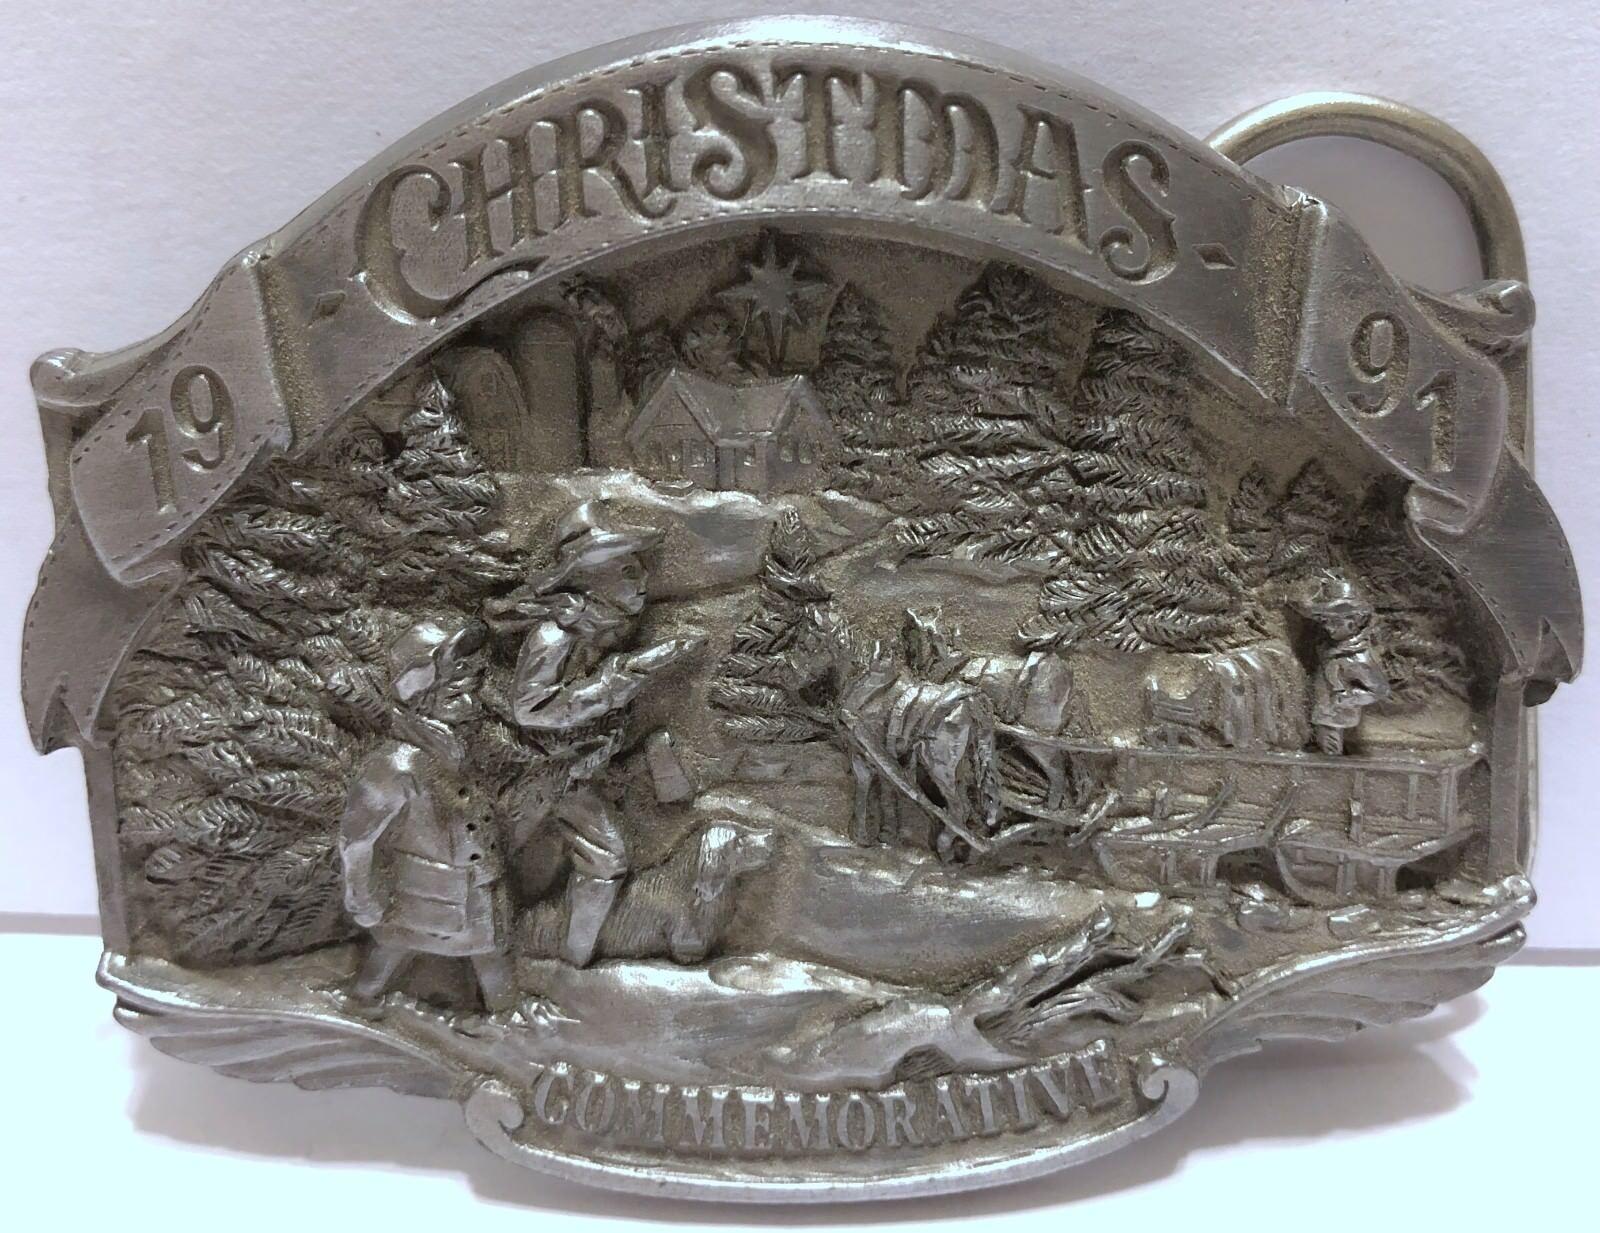 VTG Arroyo Grande Christmas Commemorative Stagecoach Pioneers Through River 1991